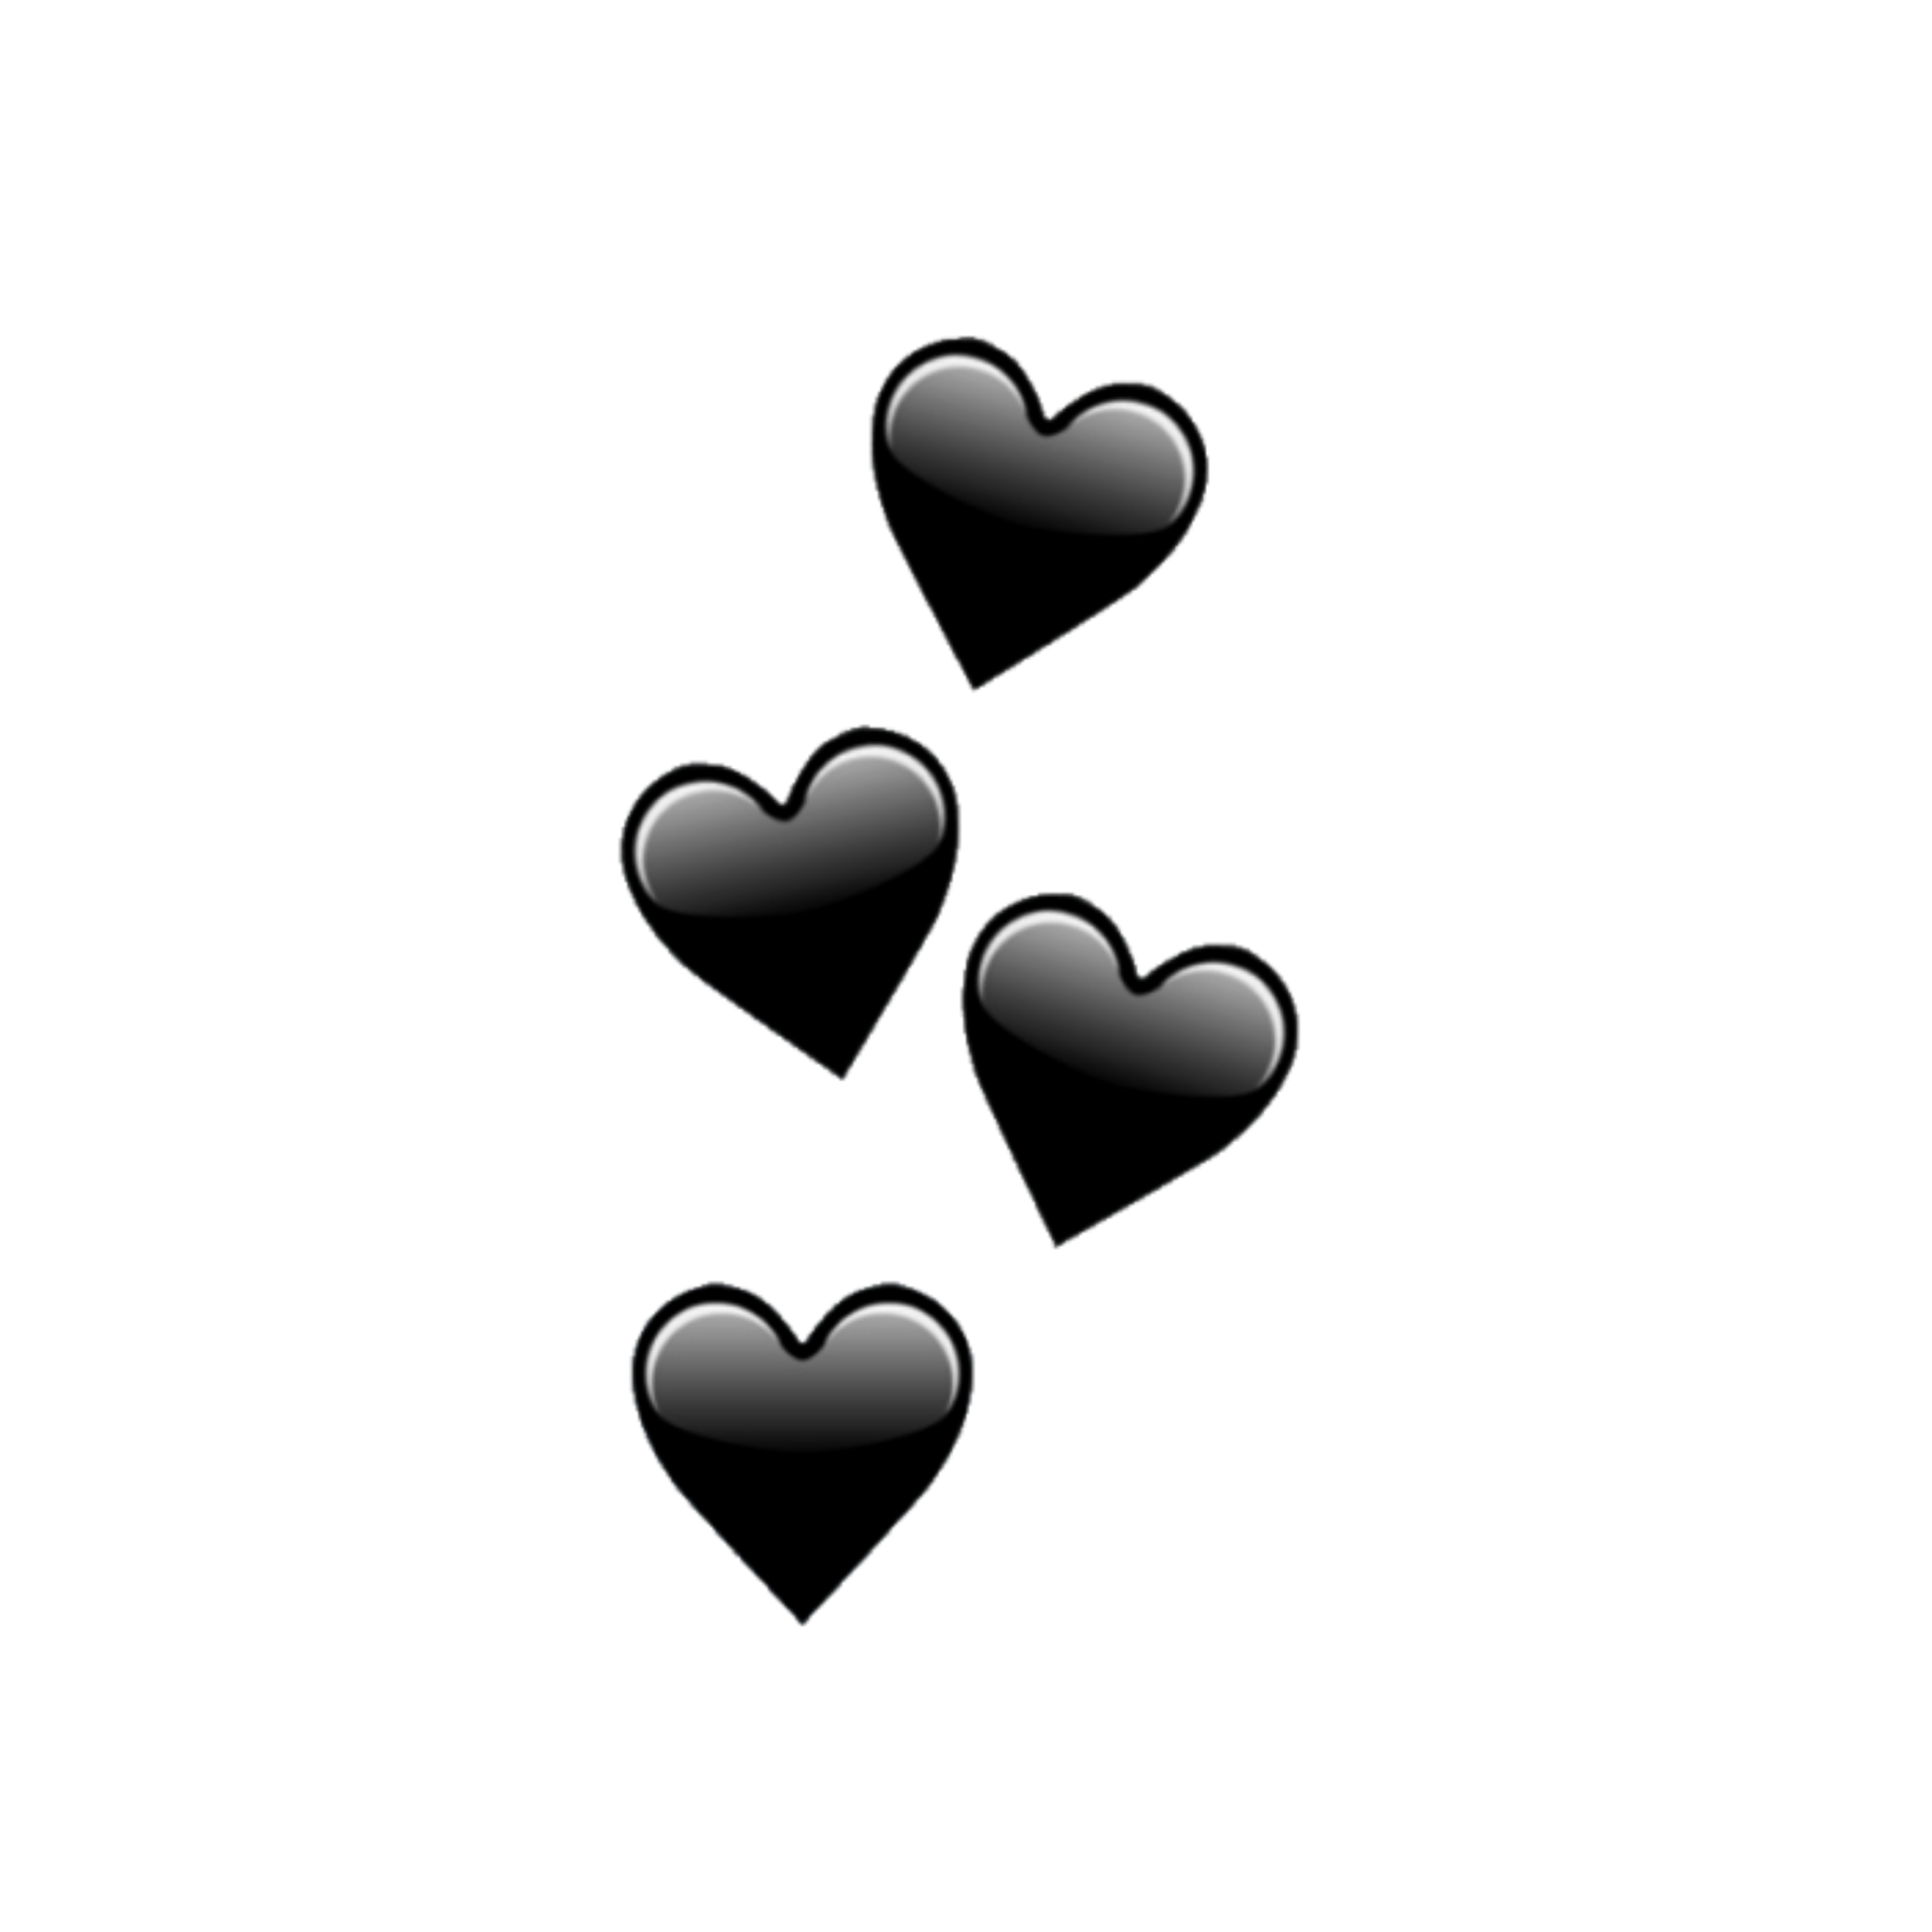 Black Heart Emoji Wallpaper